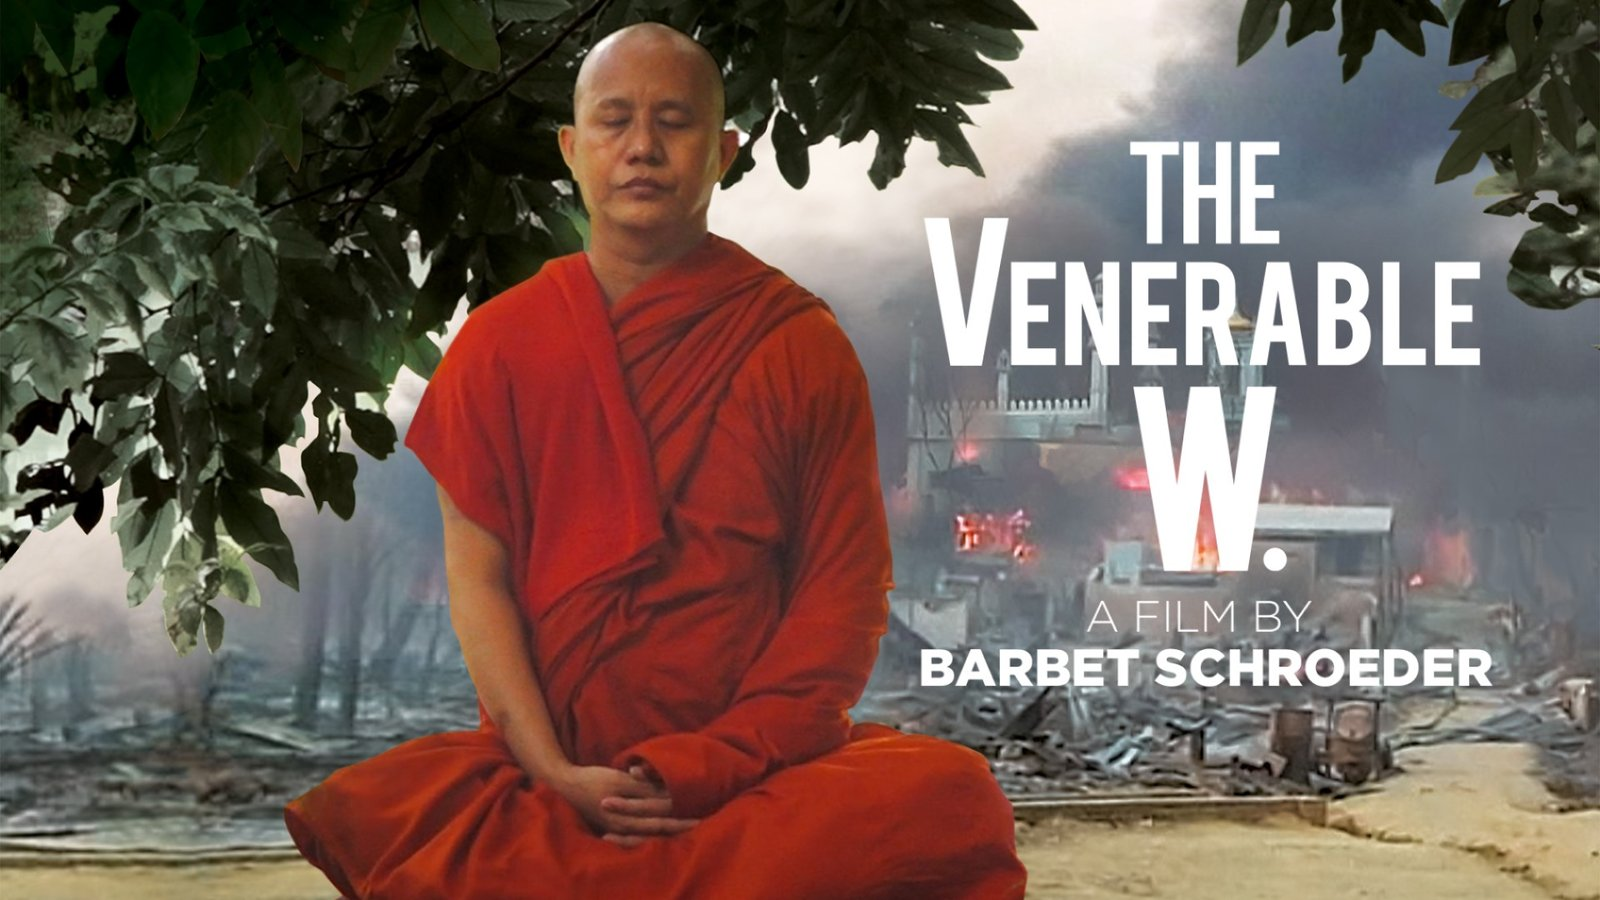 The Venerable W